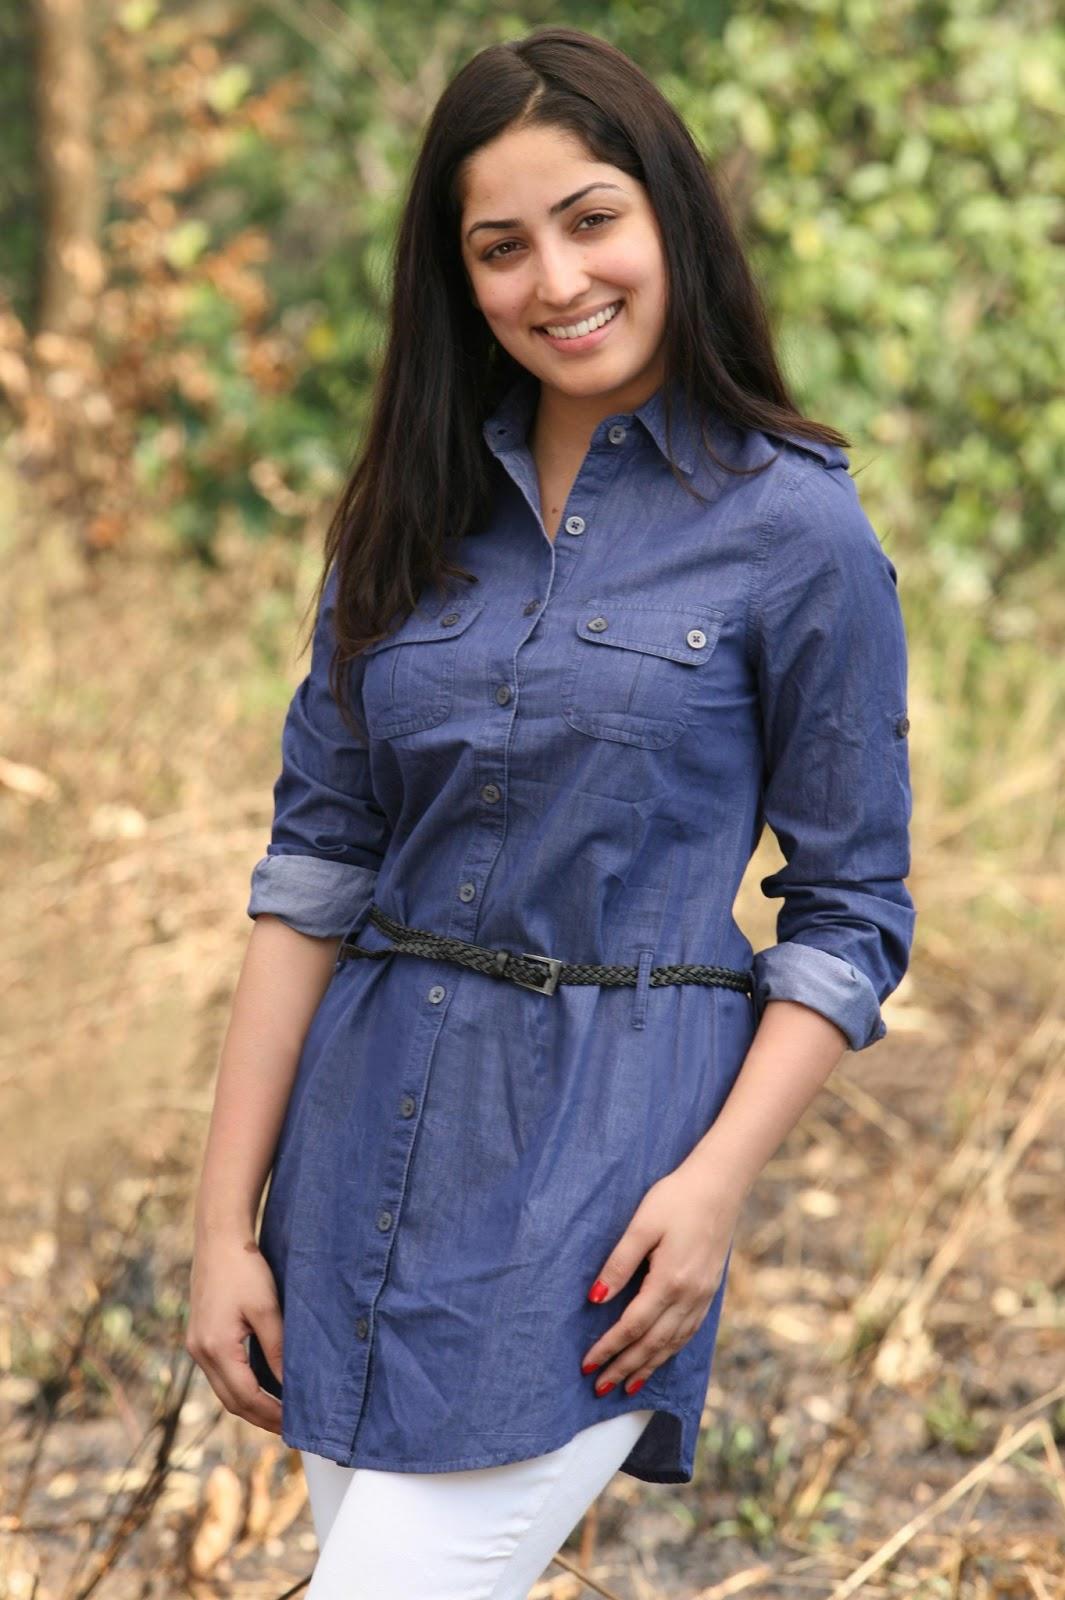 Yami Gautam Hot And Beautiful High Resolution Images Of Bollywood Actresses